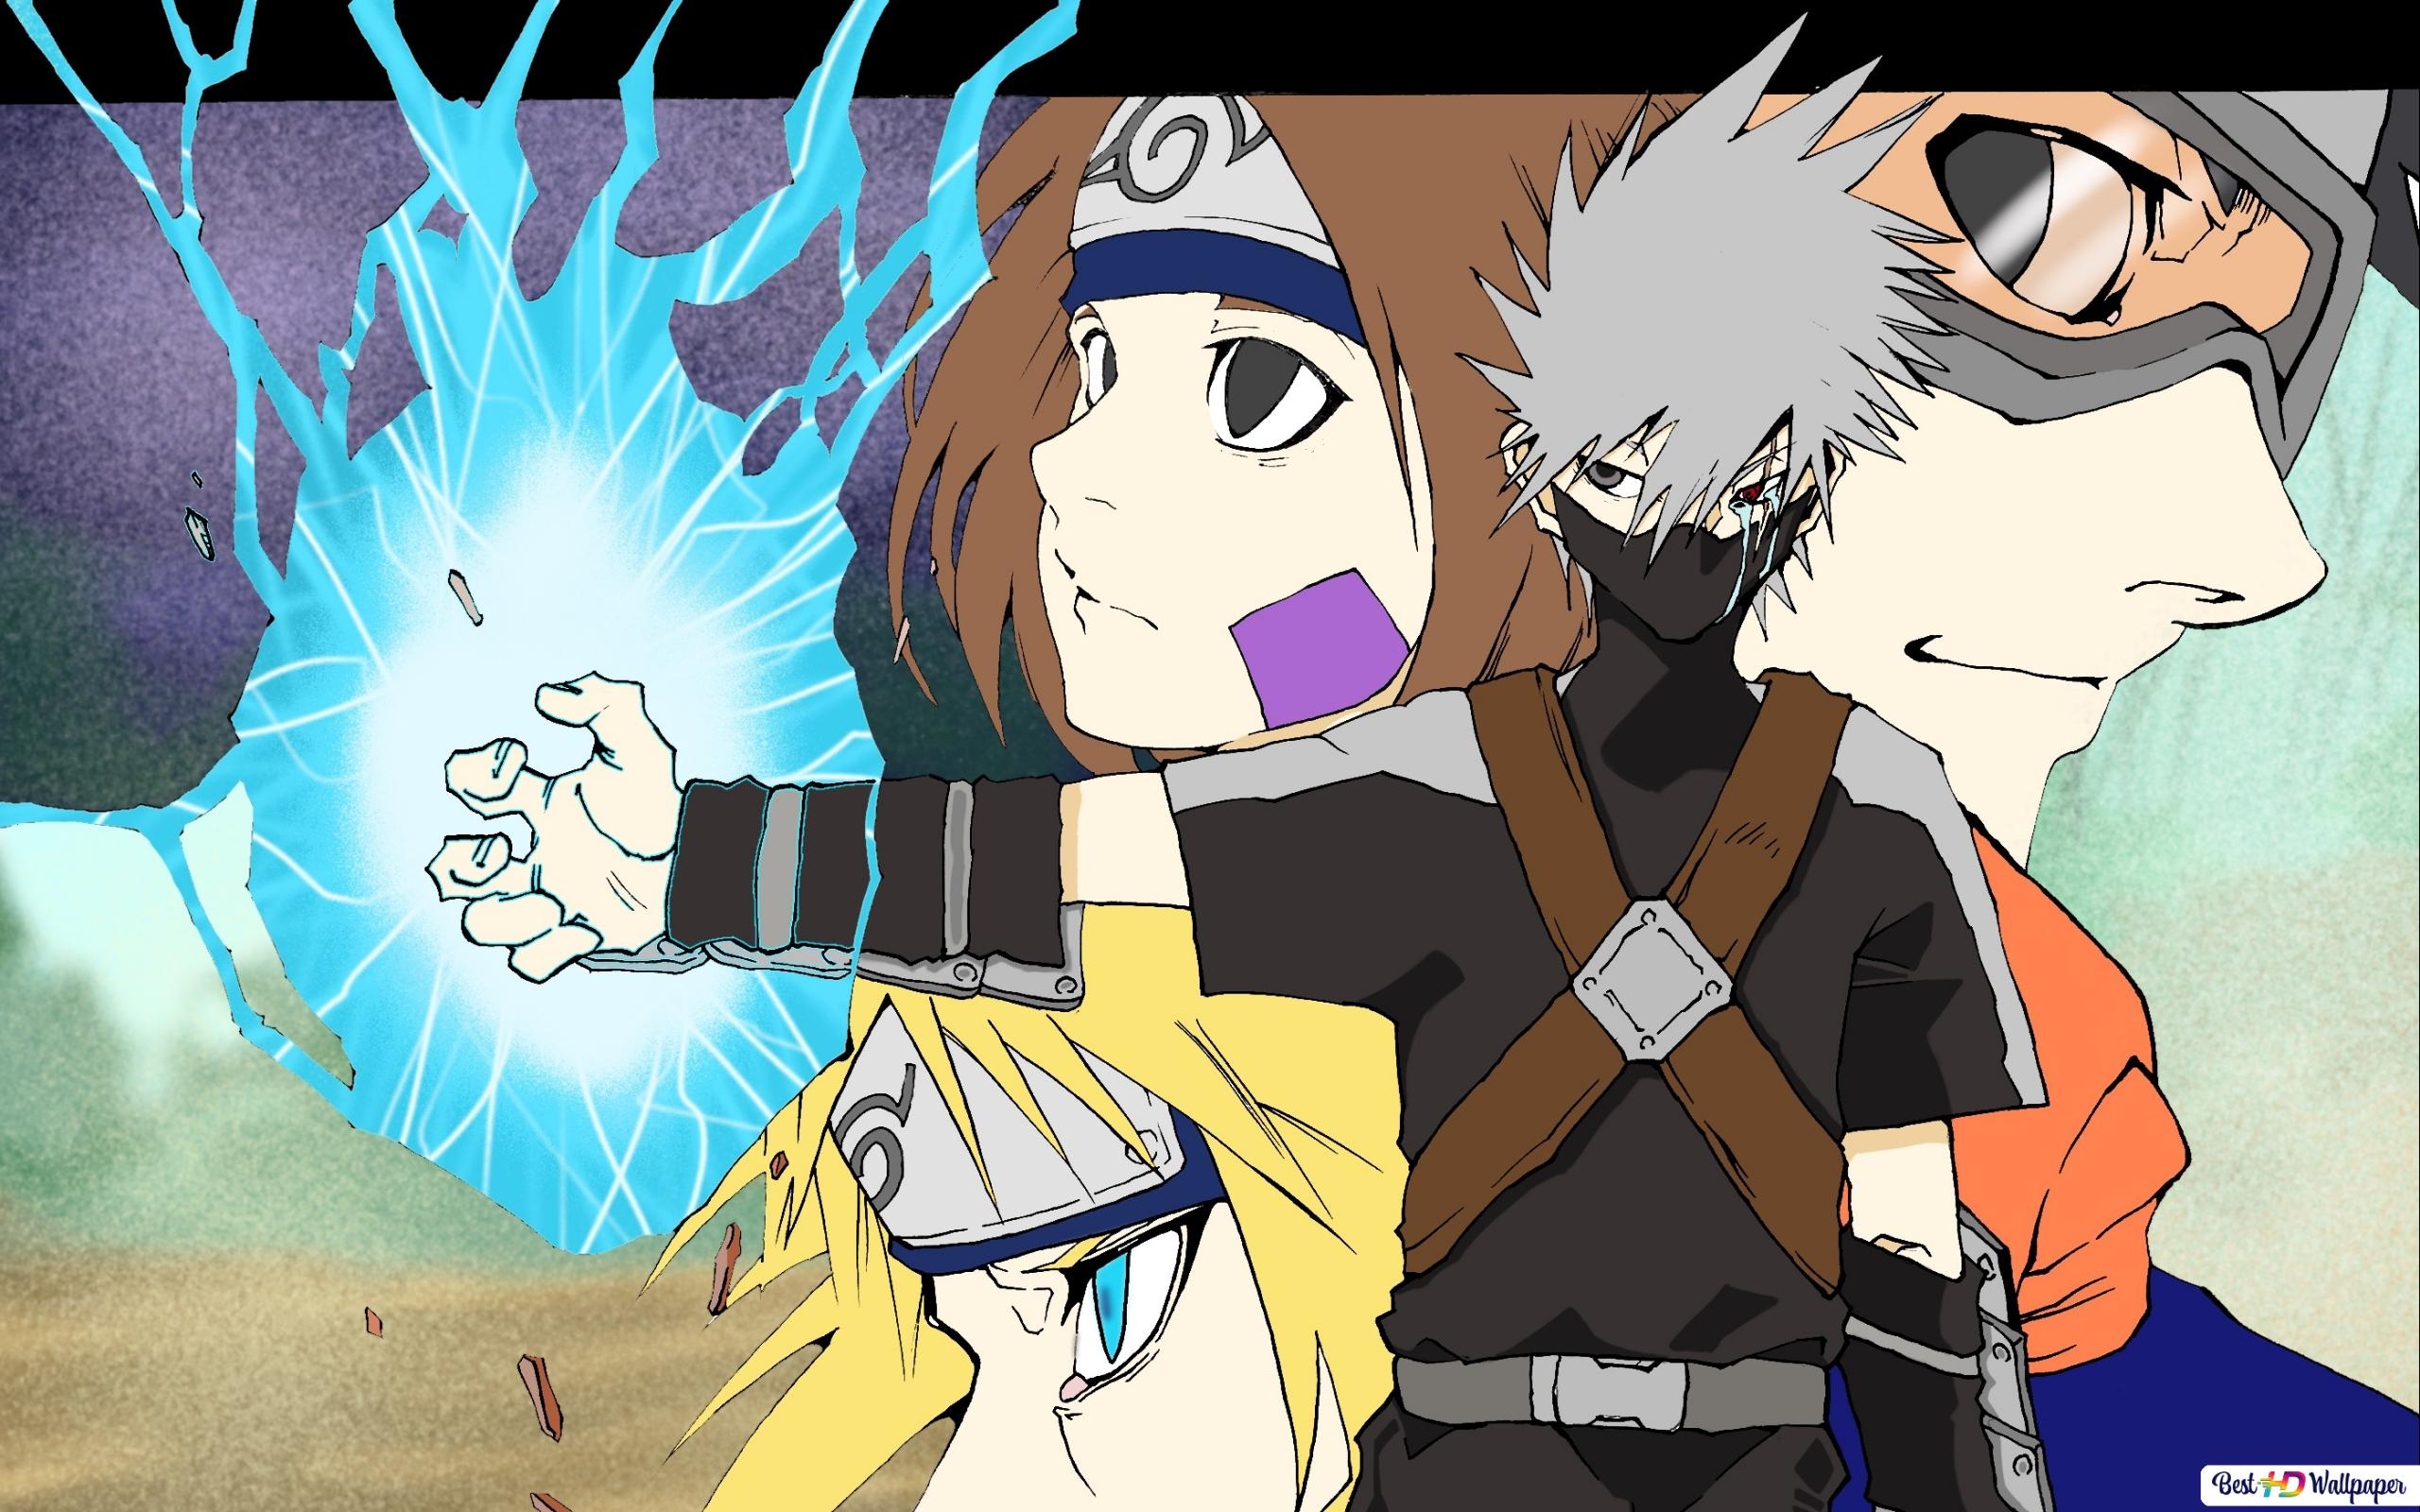 Naruto Shippuden Team 7 Wallpaper Hd 240x400